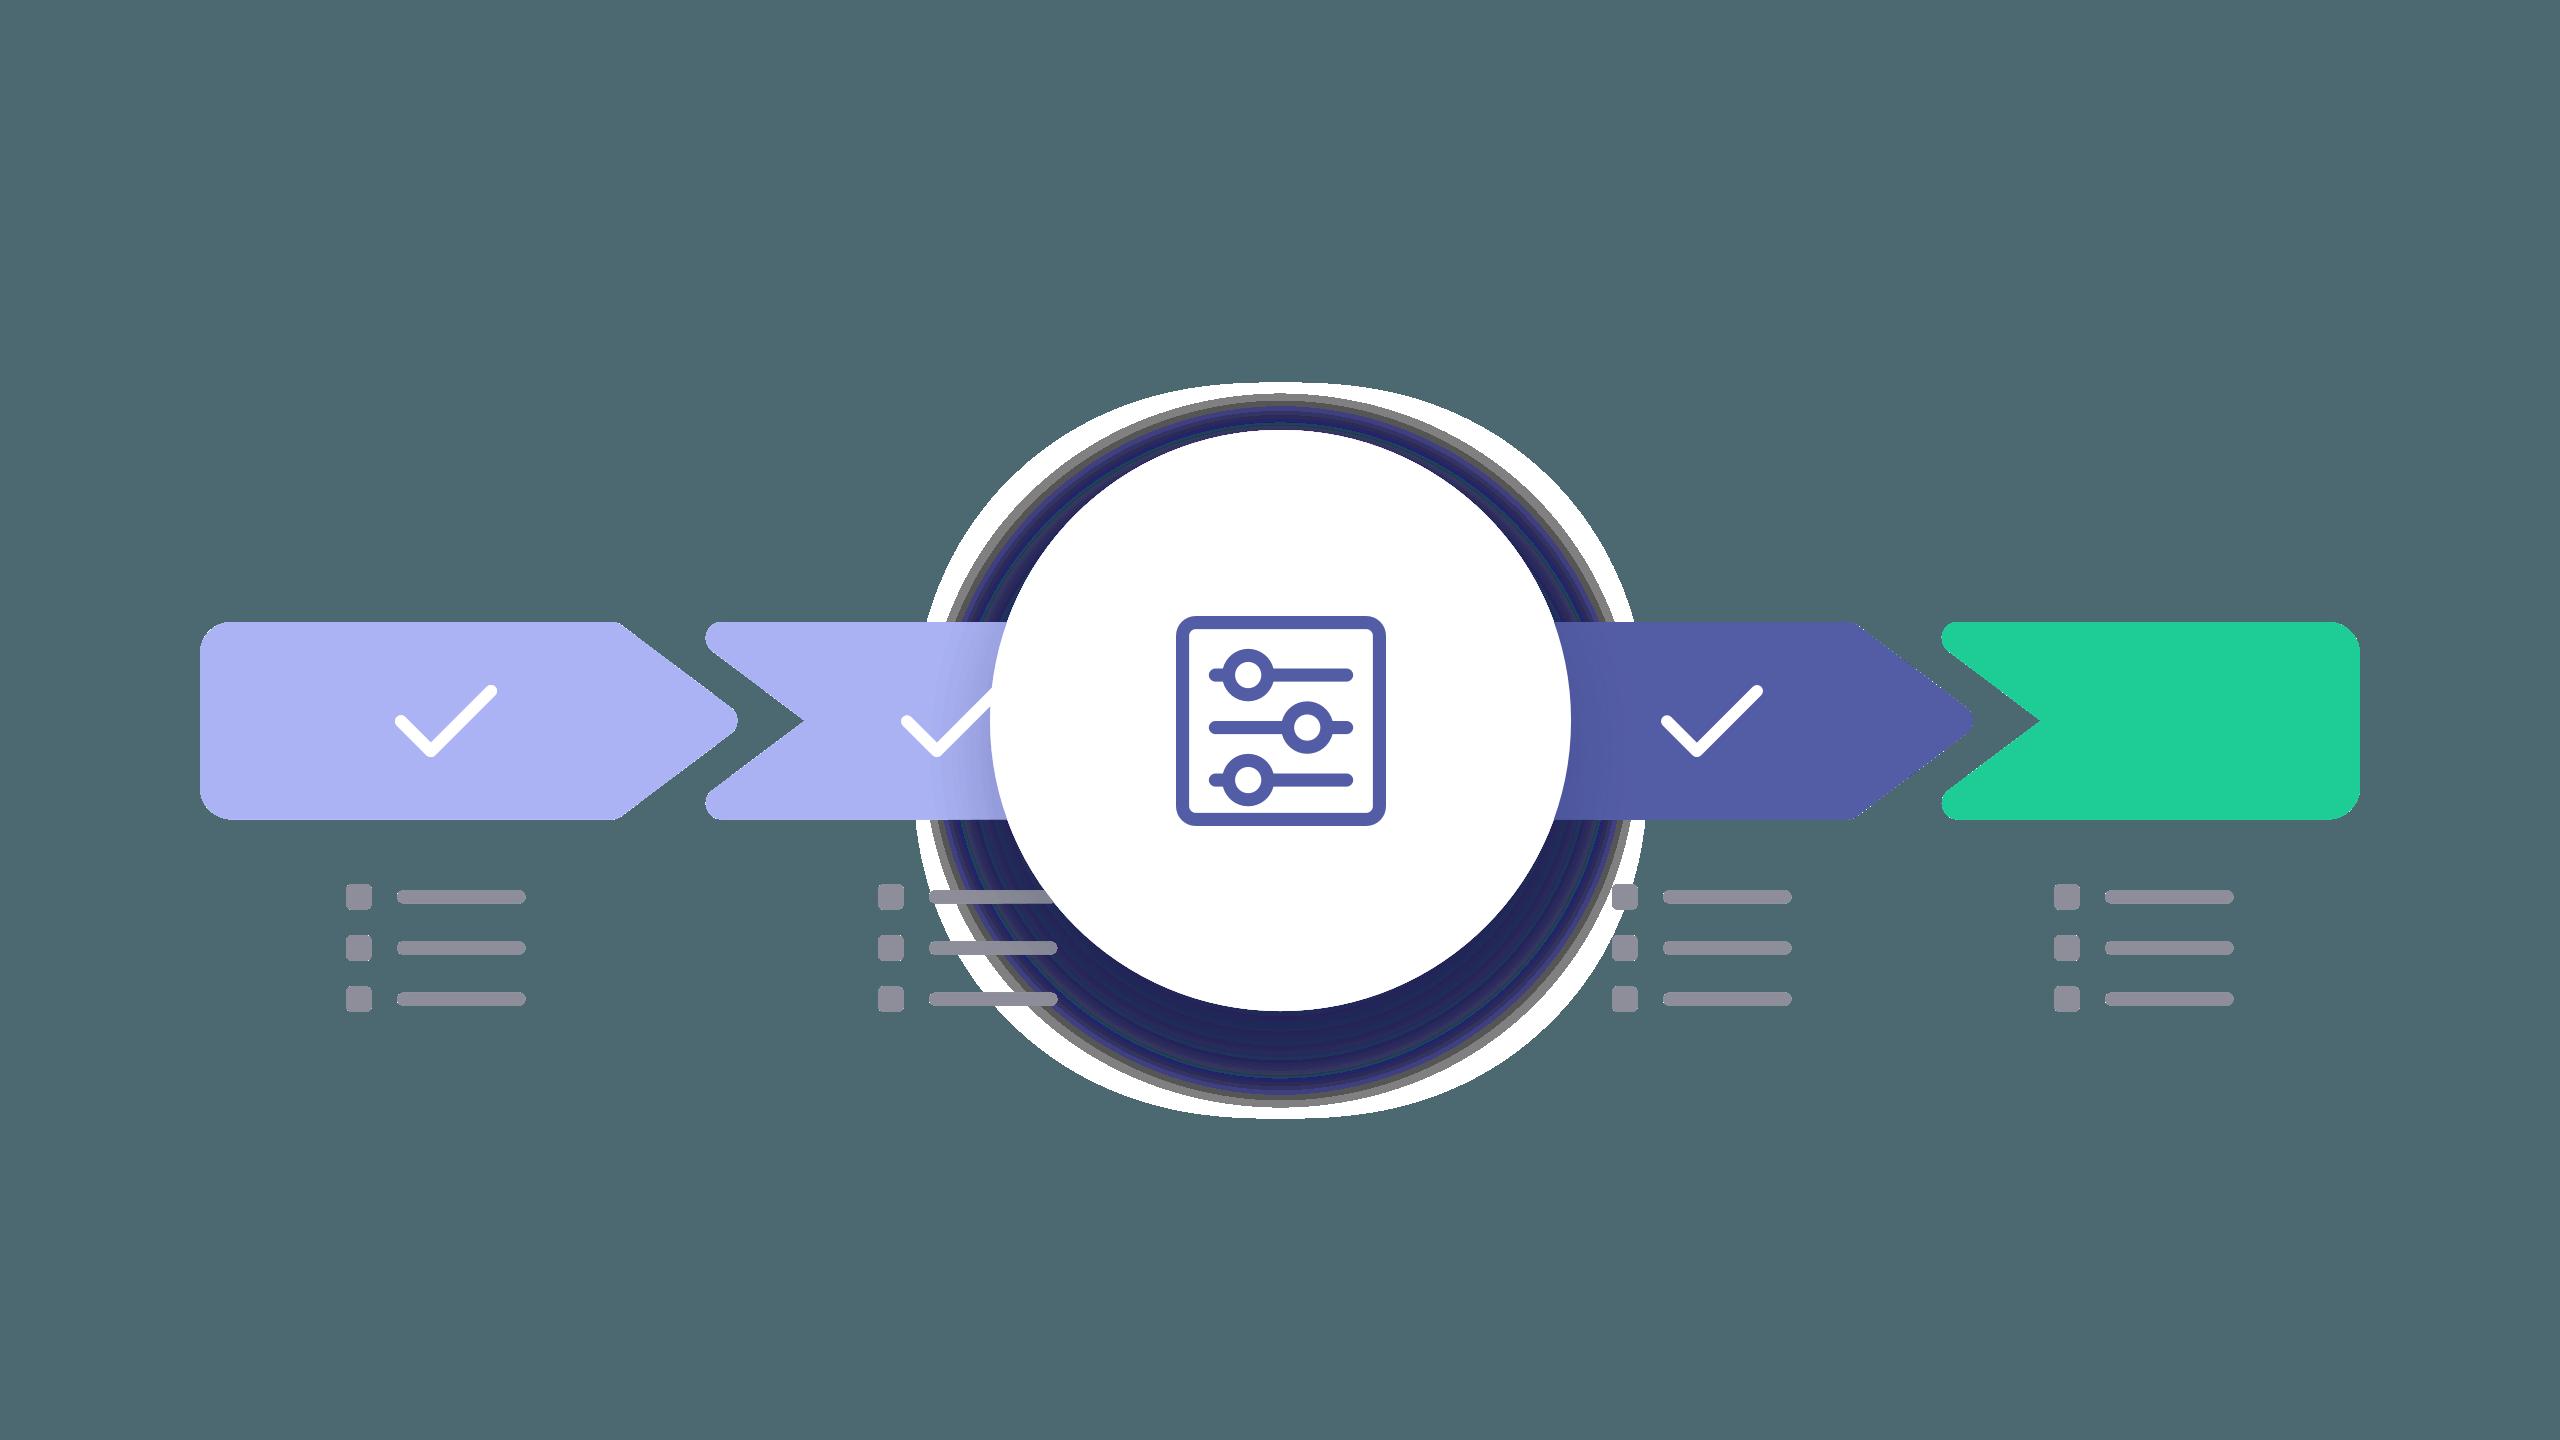 Providing Visibility Across Business Silos